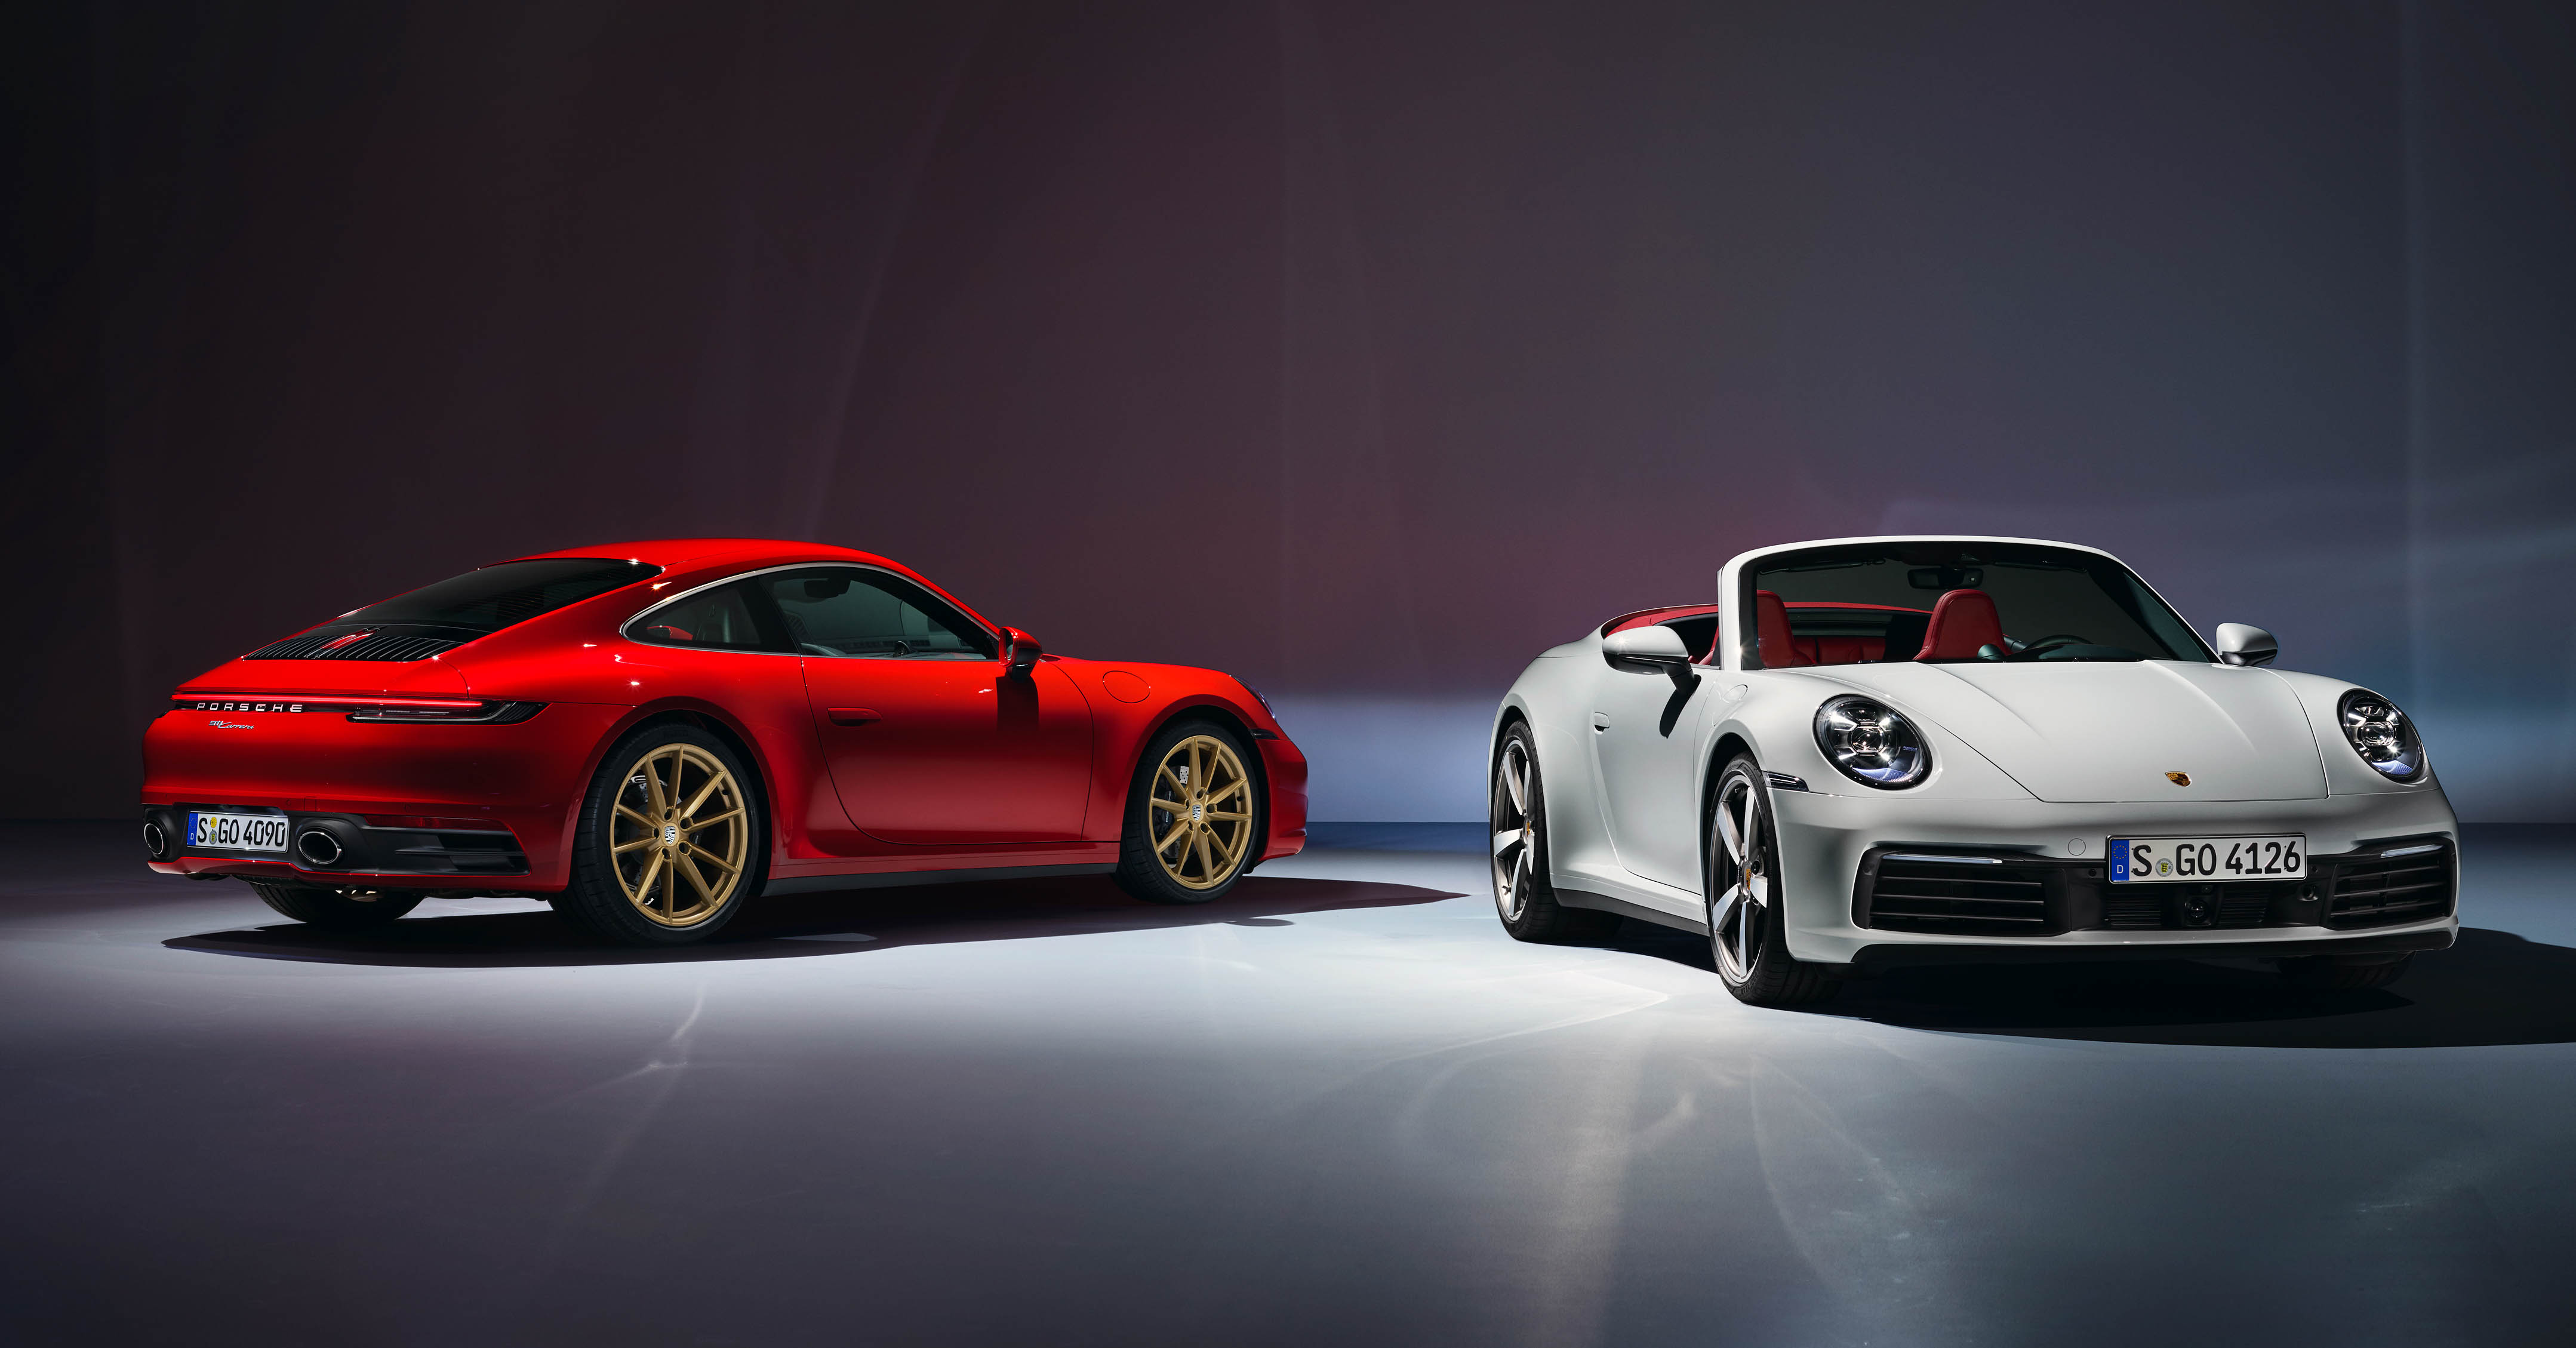 992 Porsche 911 Carrera and Carrera Cabriolet debut - paultan.org